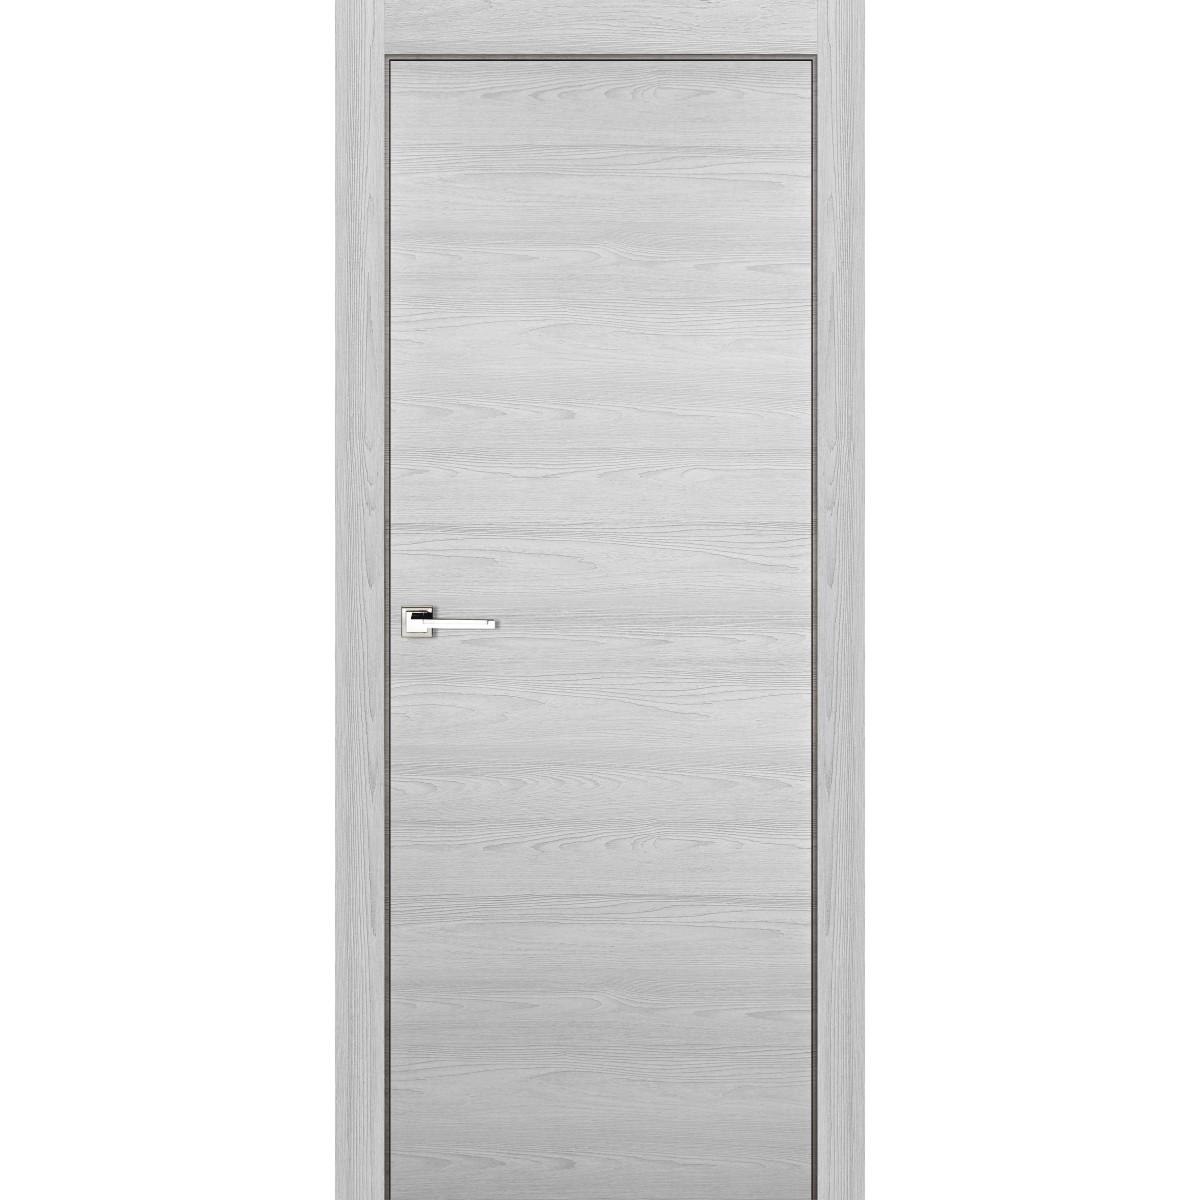 Дверь Межкомнатная Глухая 60x200 Ламинация Цвет Ясень Серый